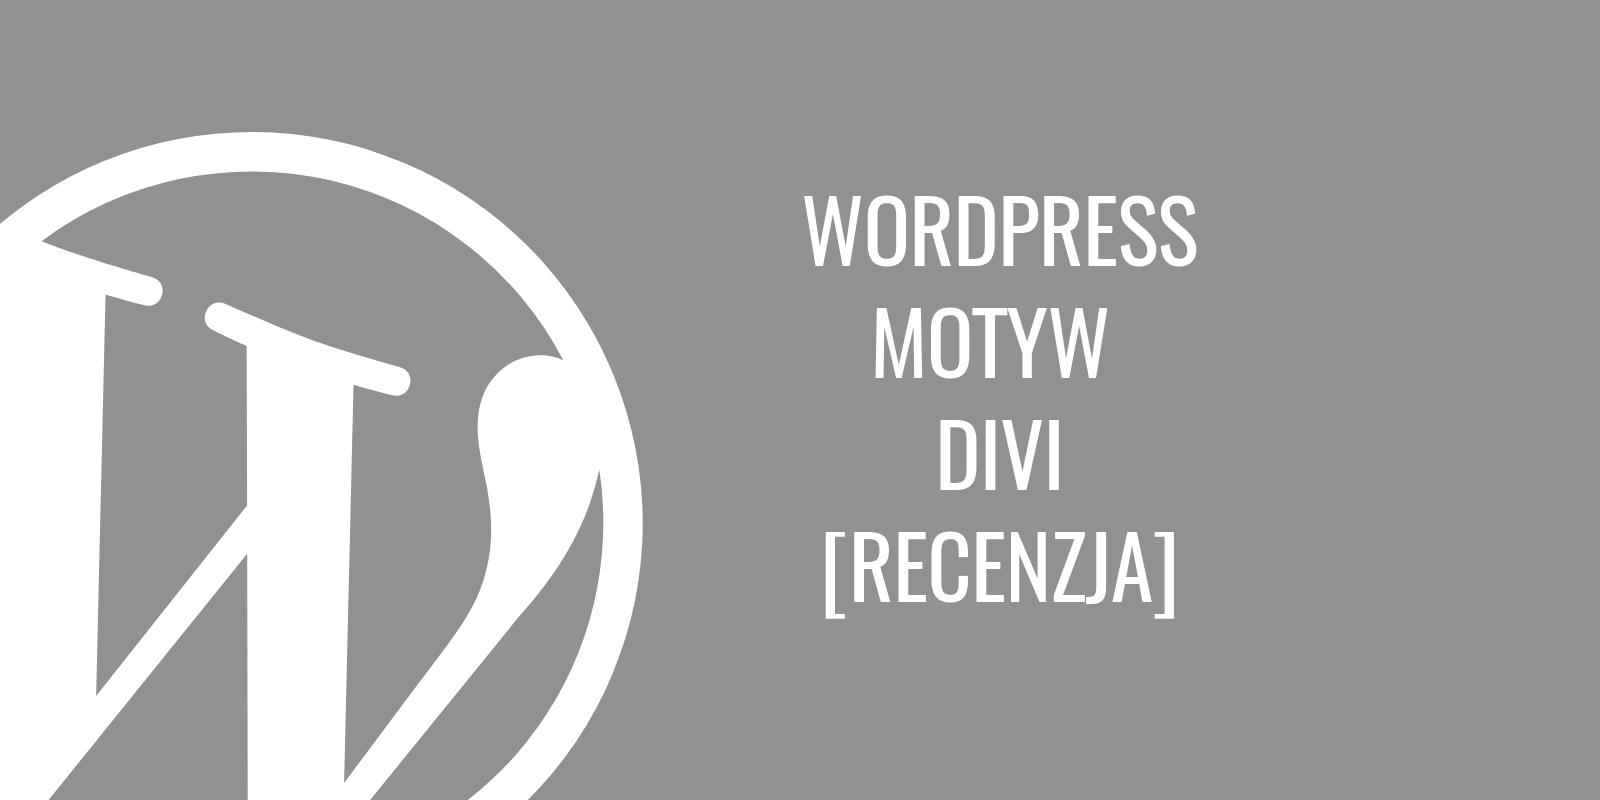 WordPress Motyw Divi